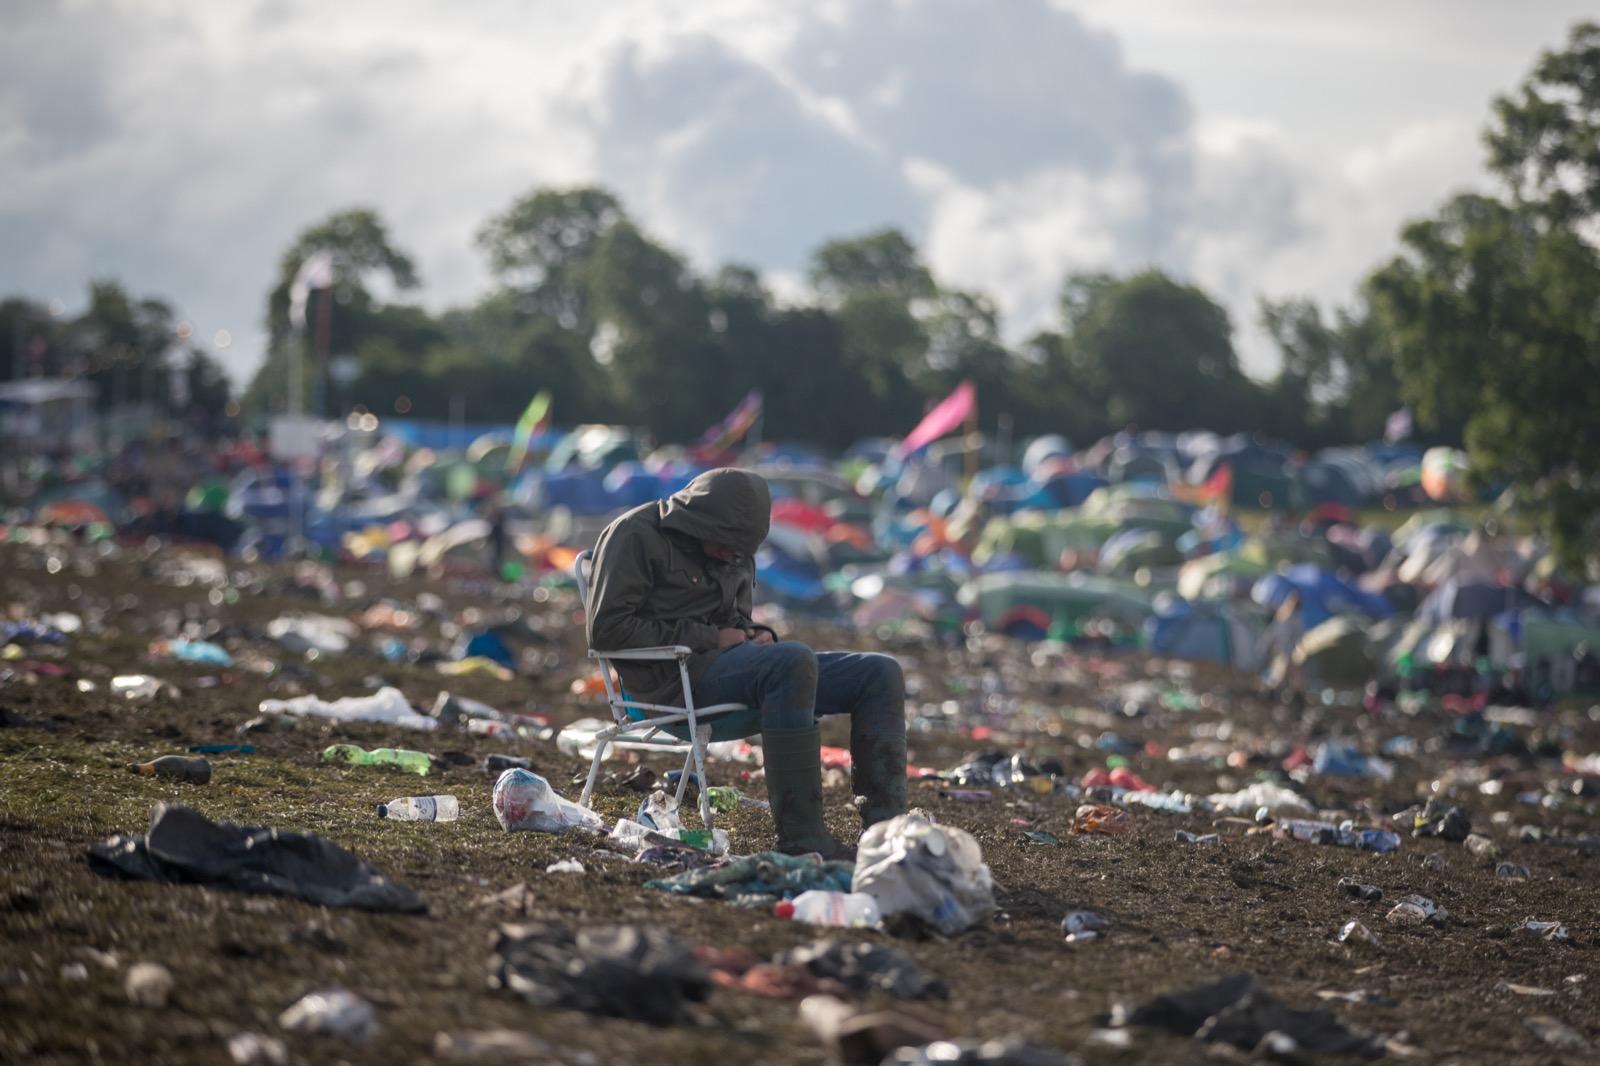 Clean up begins at the Glastonbury Festival 2016 at Worthy Farm, Pilton. Matt Cardy/Getty Images